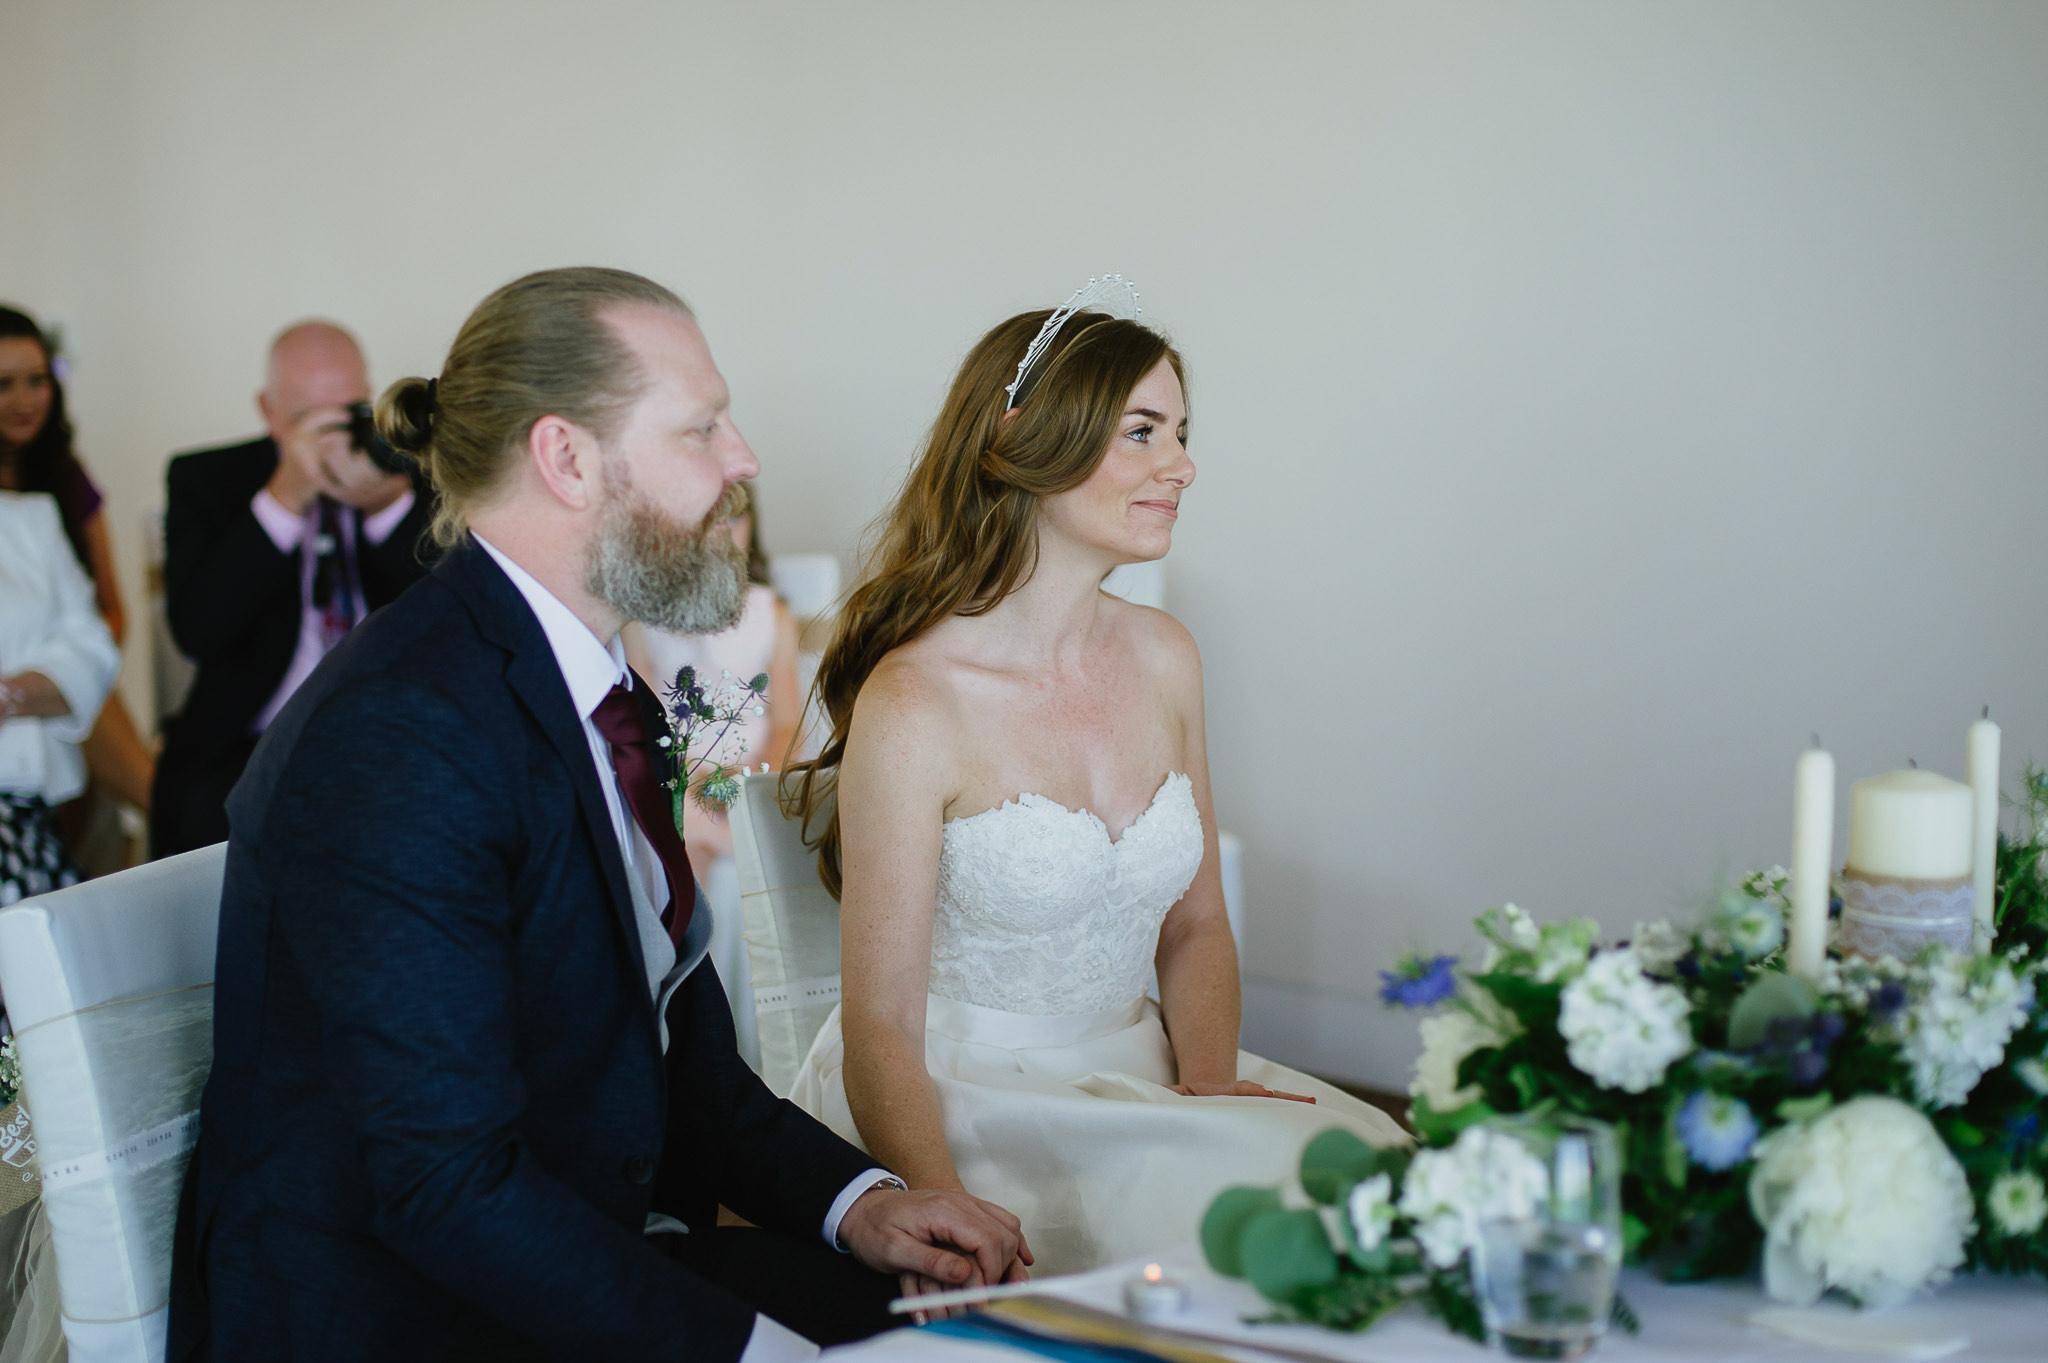 Cliff House Hotel Wedding Photographer Ireland-64.jpg